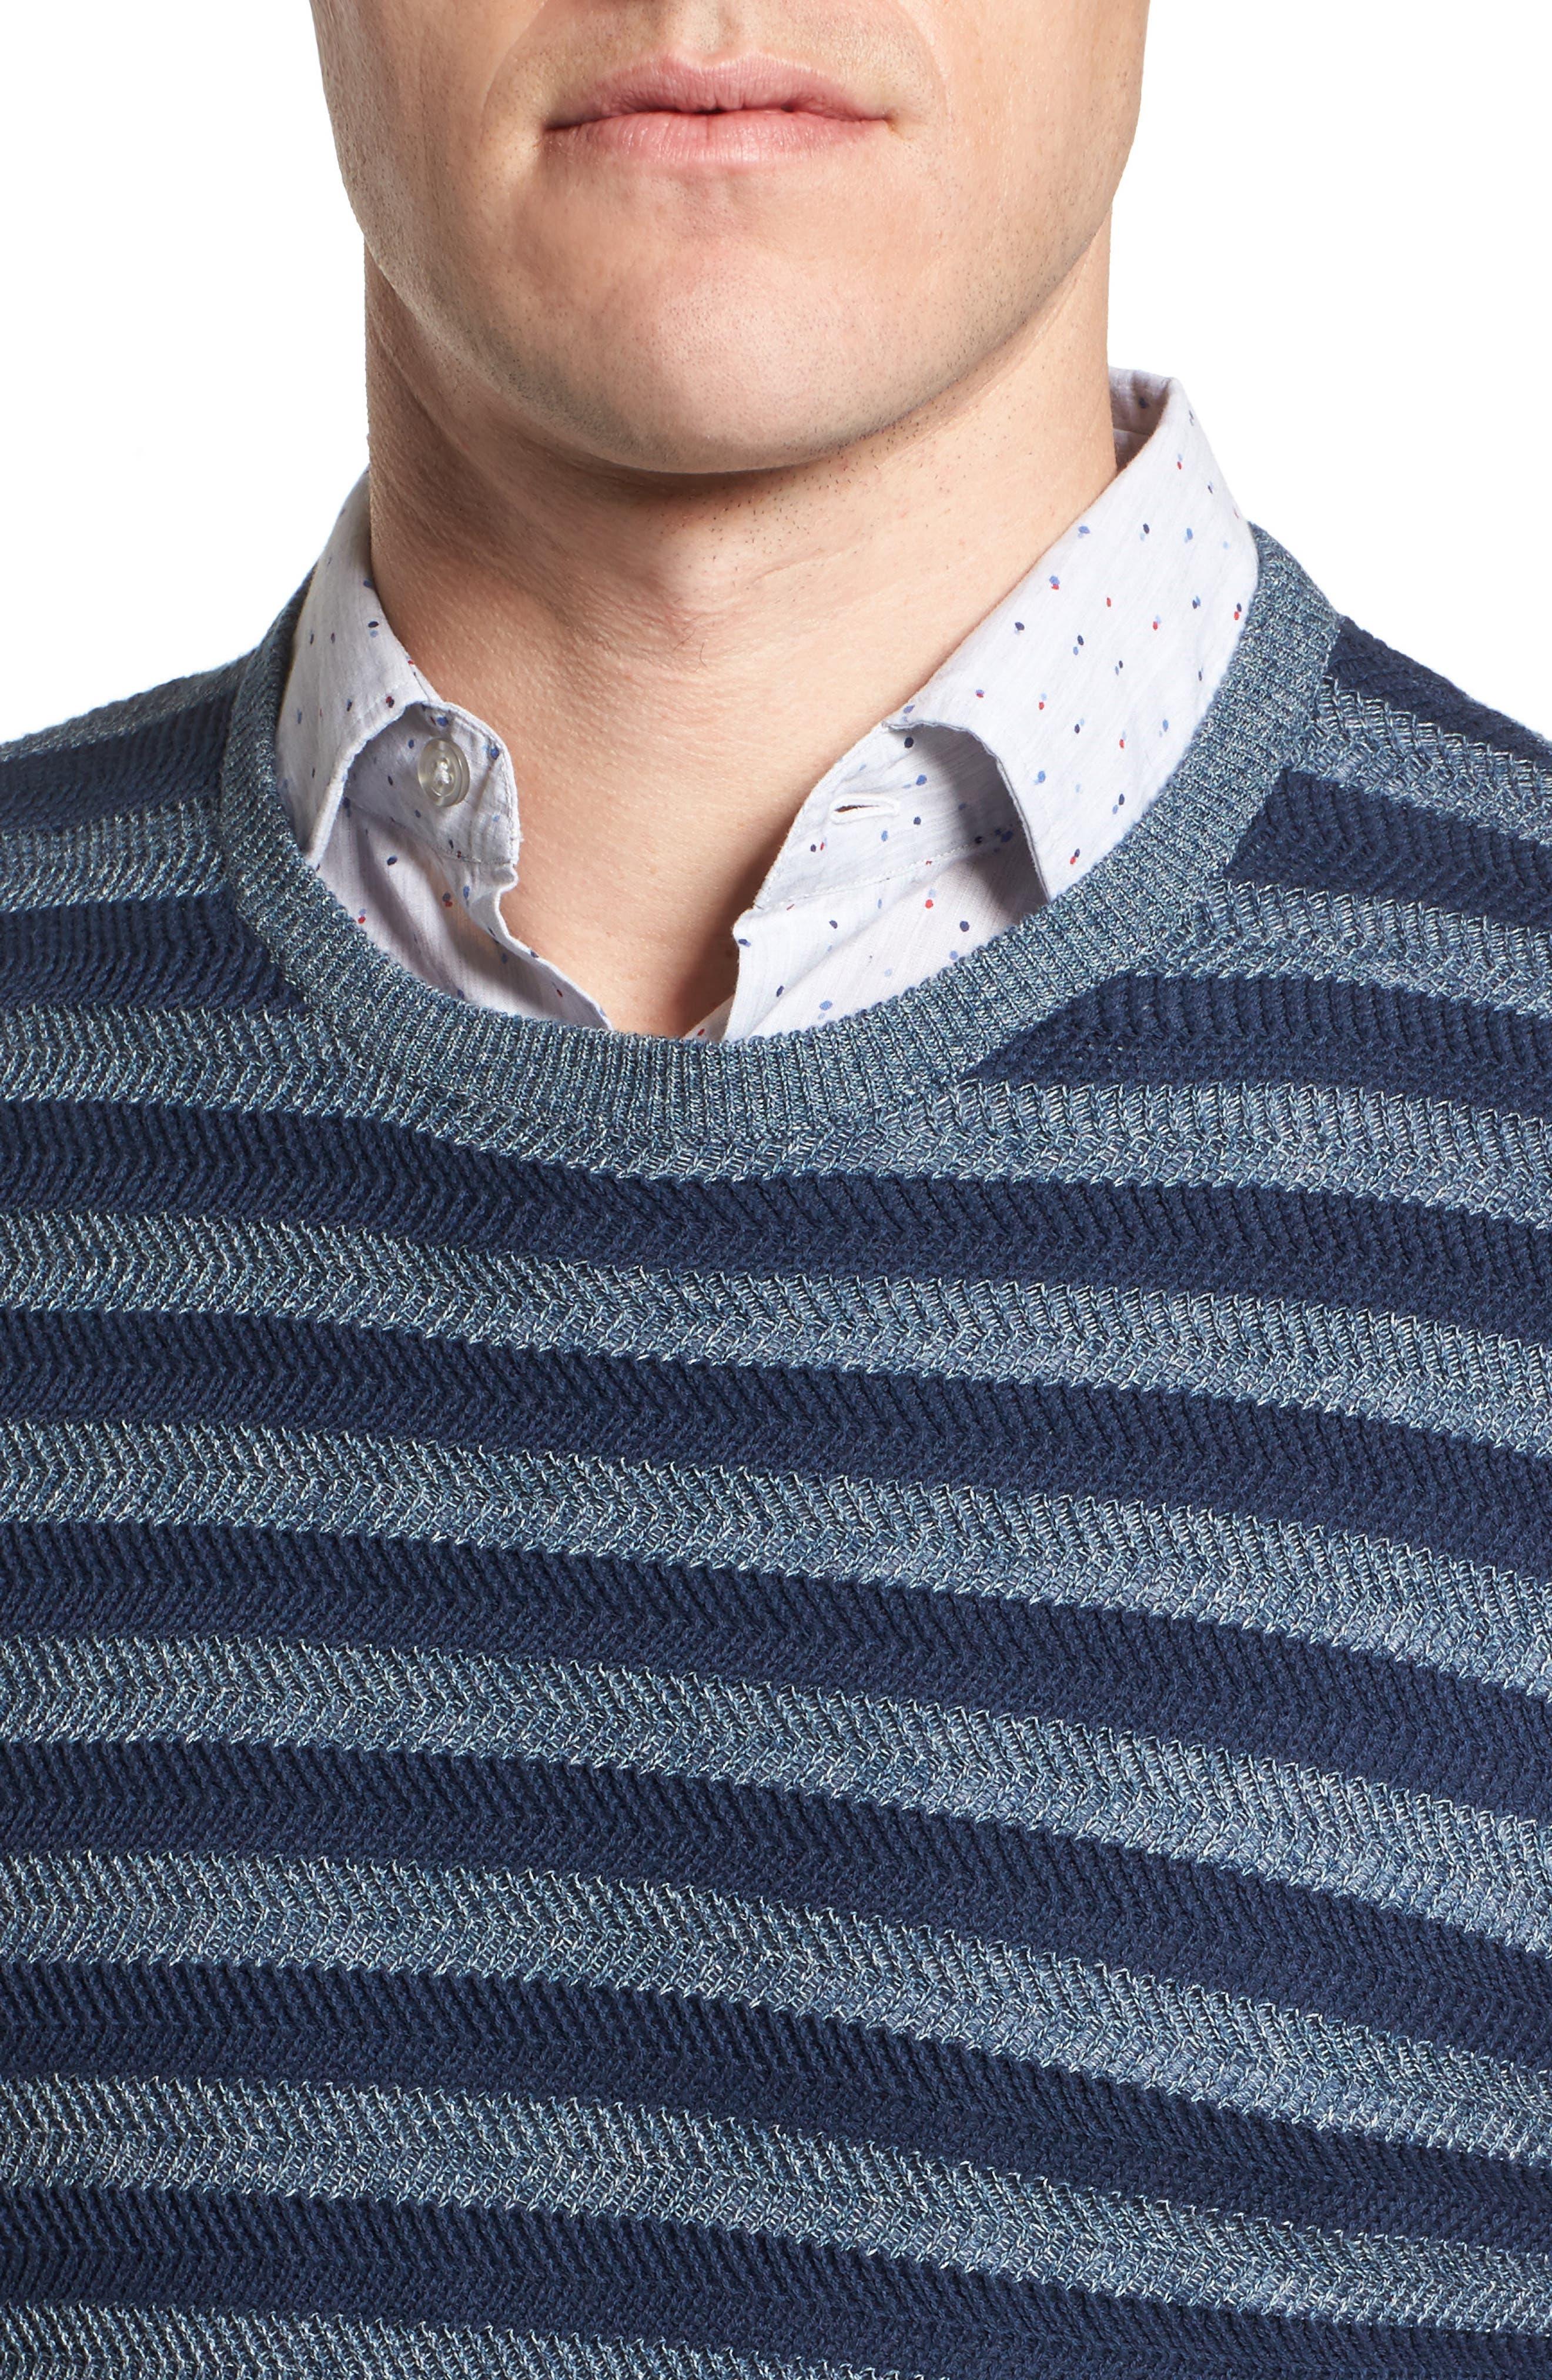 Stripe Cotton Blend Sweater,                             Alternate thumbnail 4, color,                             Navy Iris Stripe